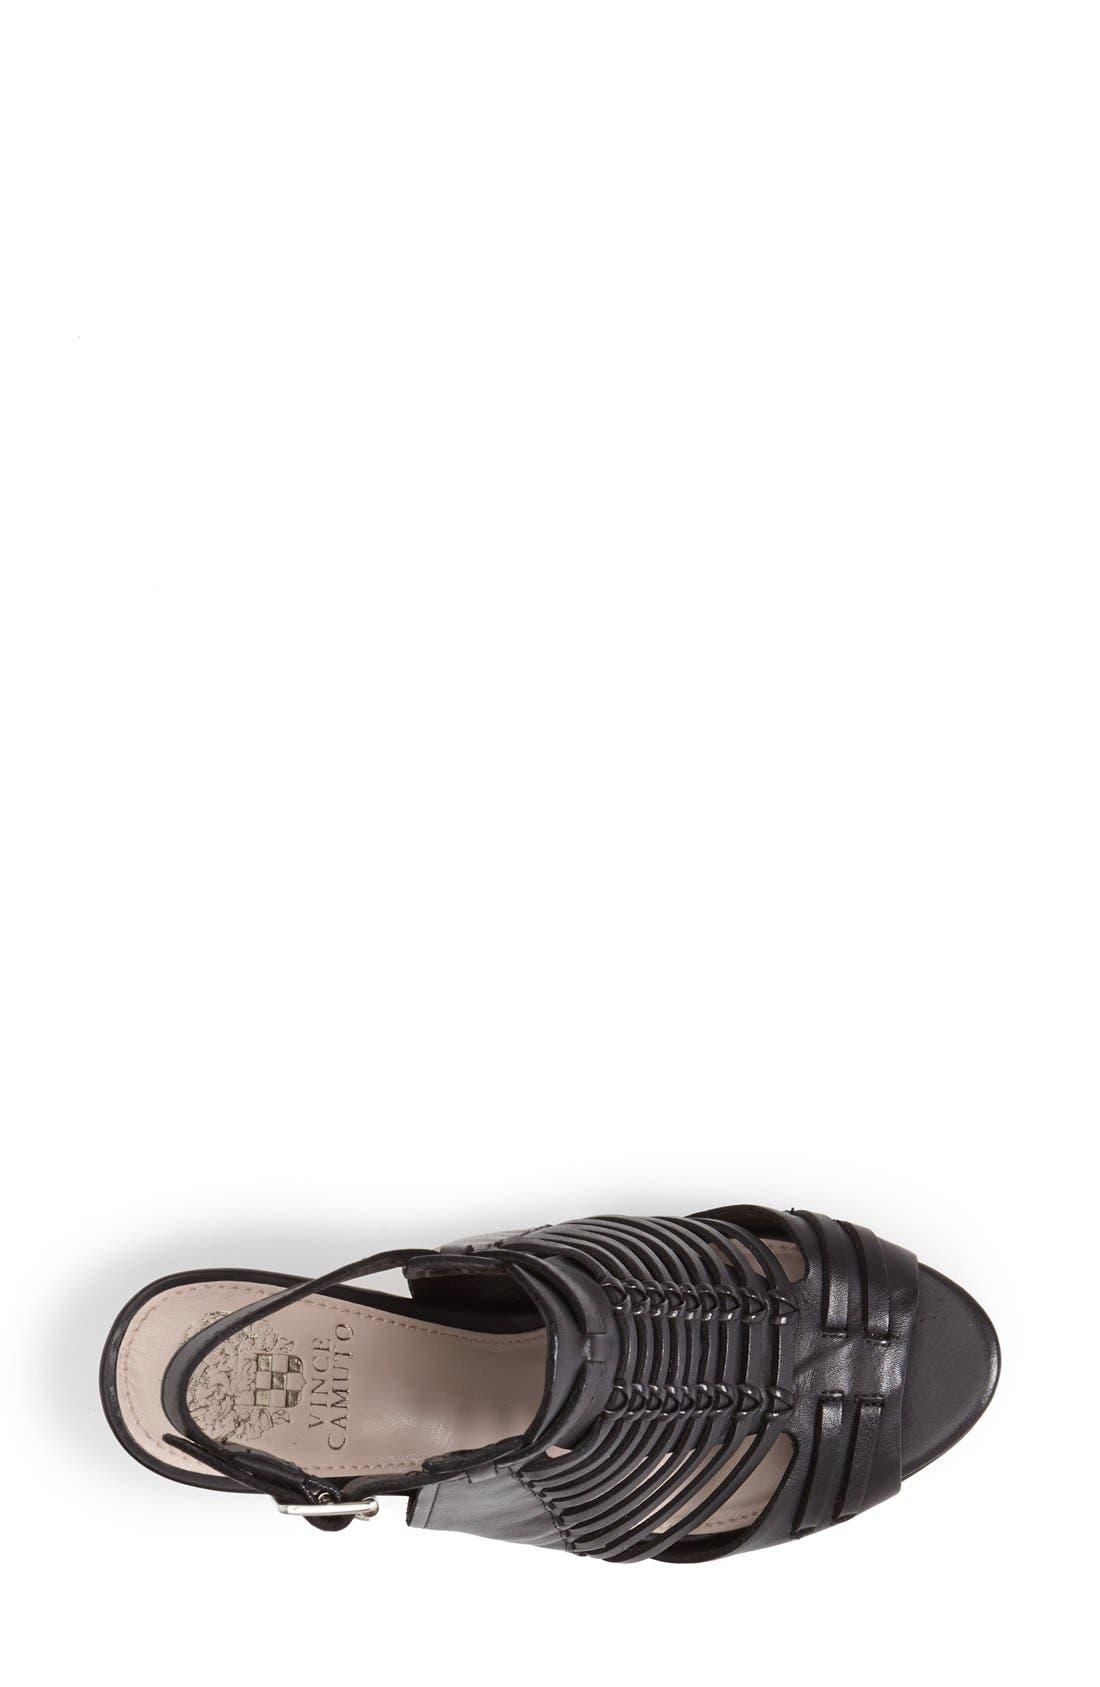 Alternate Image 3  - Vince Camuto 'Effel' Sandal (Nordstrom Exclusive)